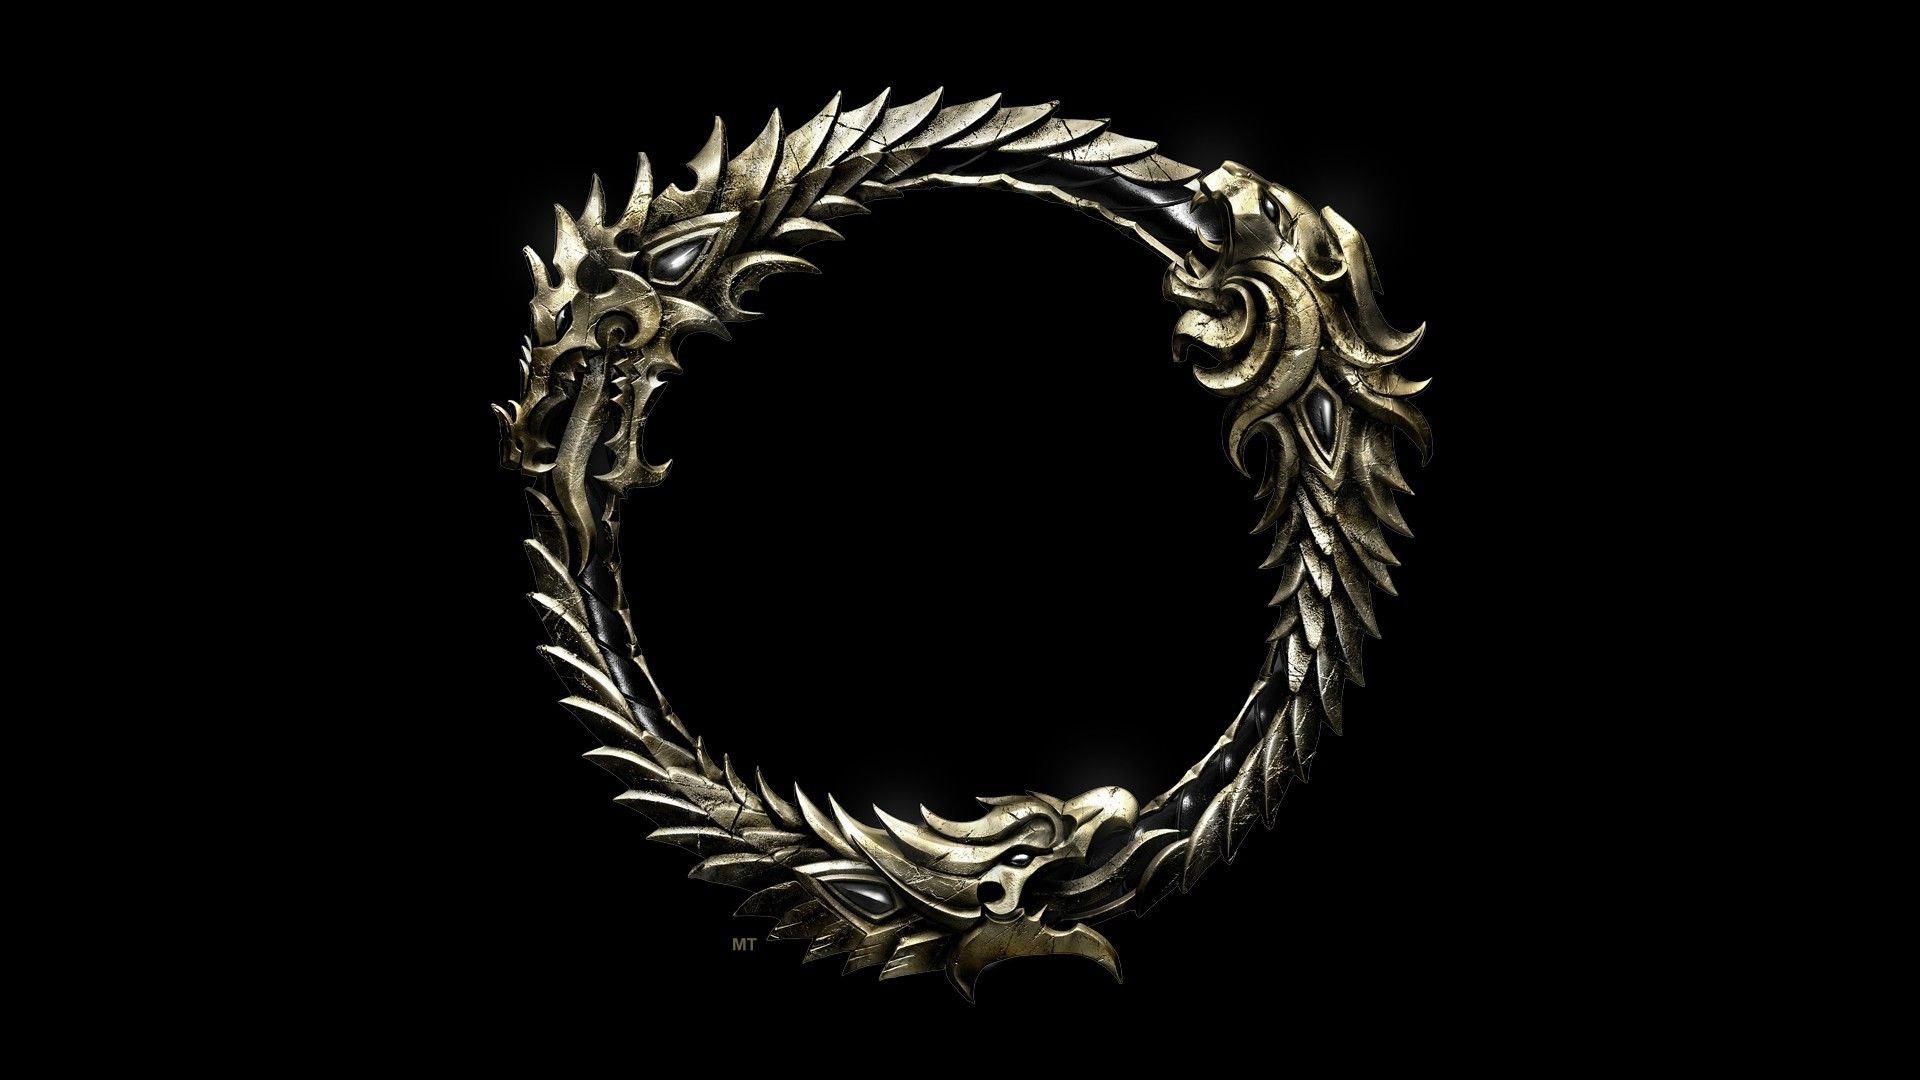 The Elder Scrolls Online Wallpapers Pictures Images